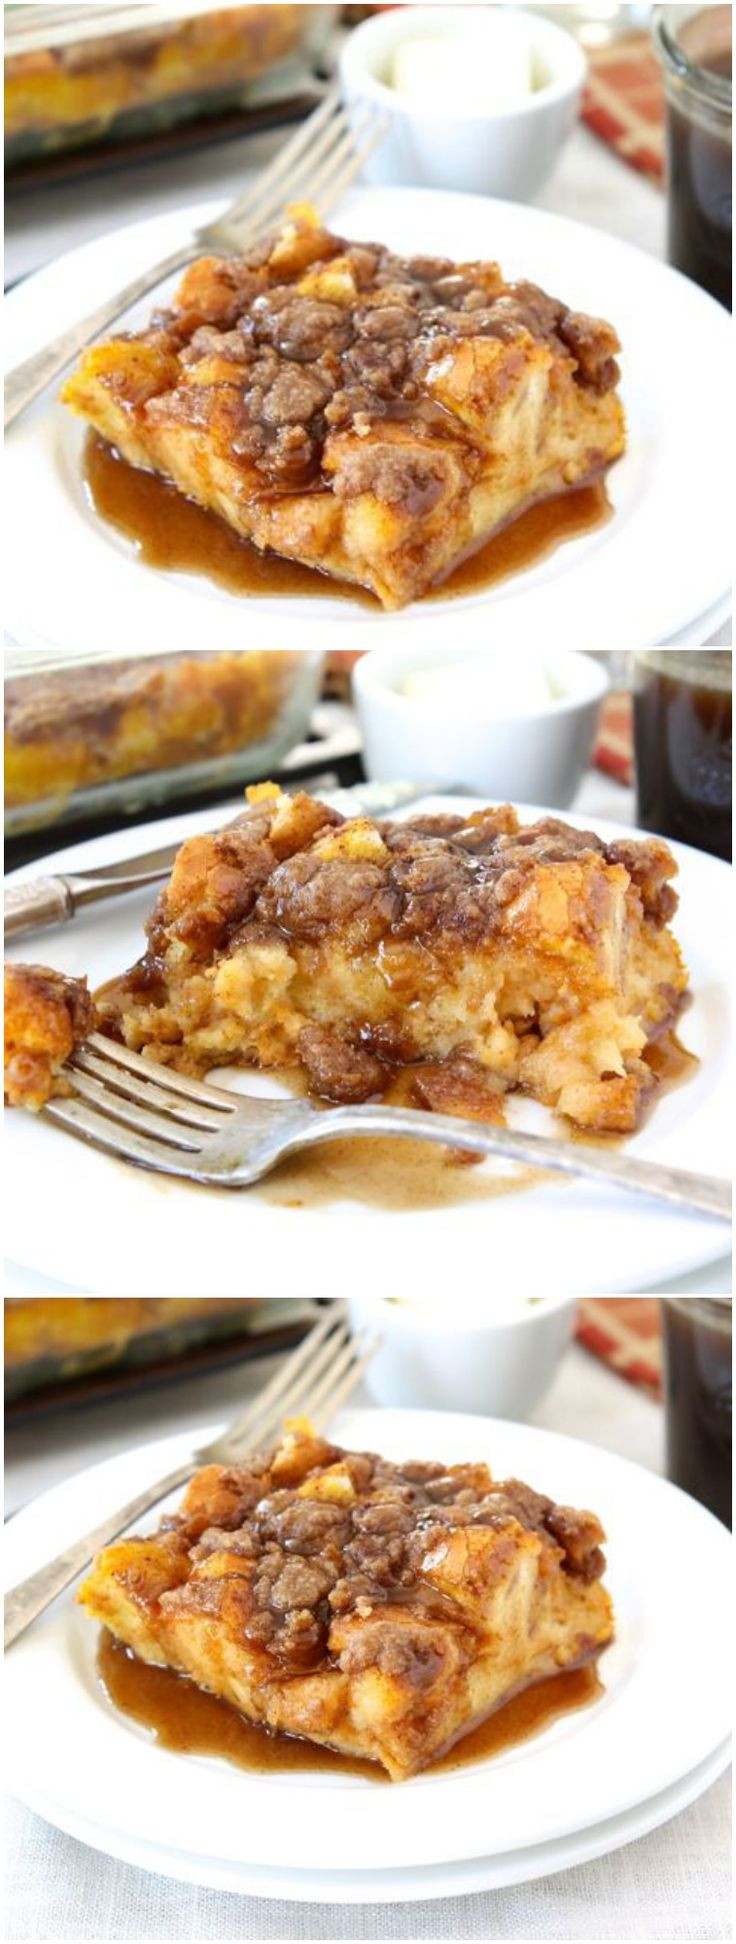 Pumpkin Breakfast Recipes  Best 20 Pumpkin french toast ideas on Pinterest